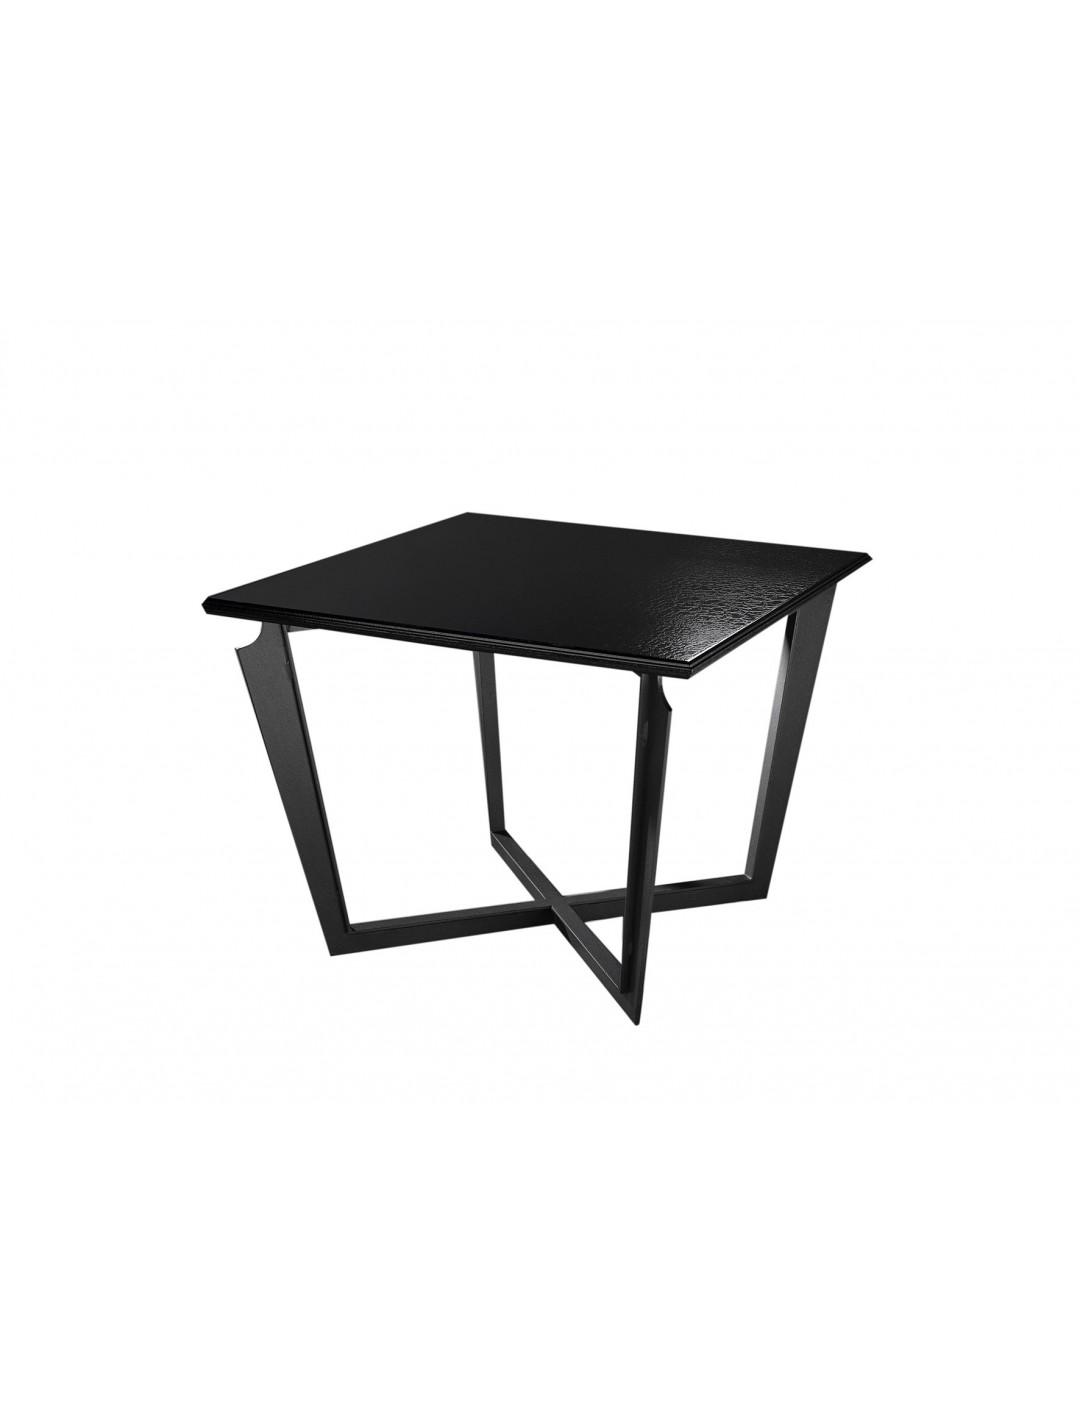 VALENTINA SQUARE SIDE TABLE, FINISH: ONYX BLACK 184 ON IRON LEGS,